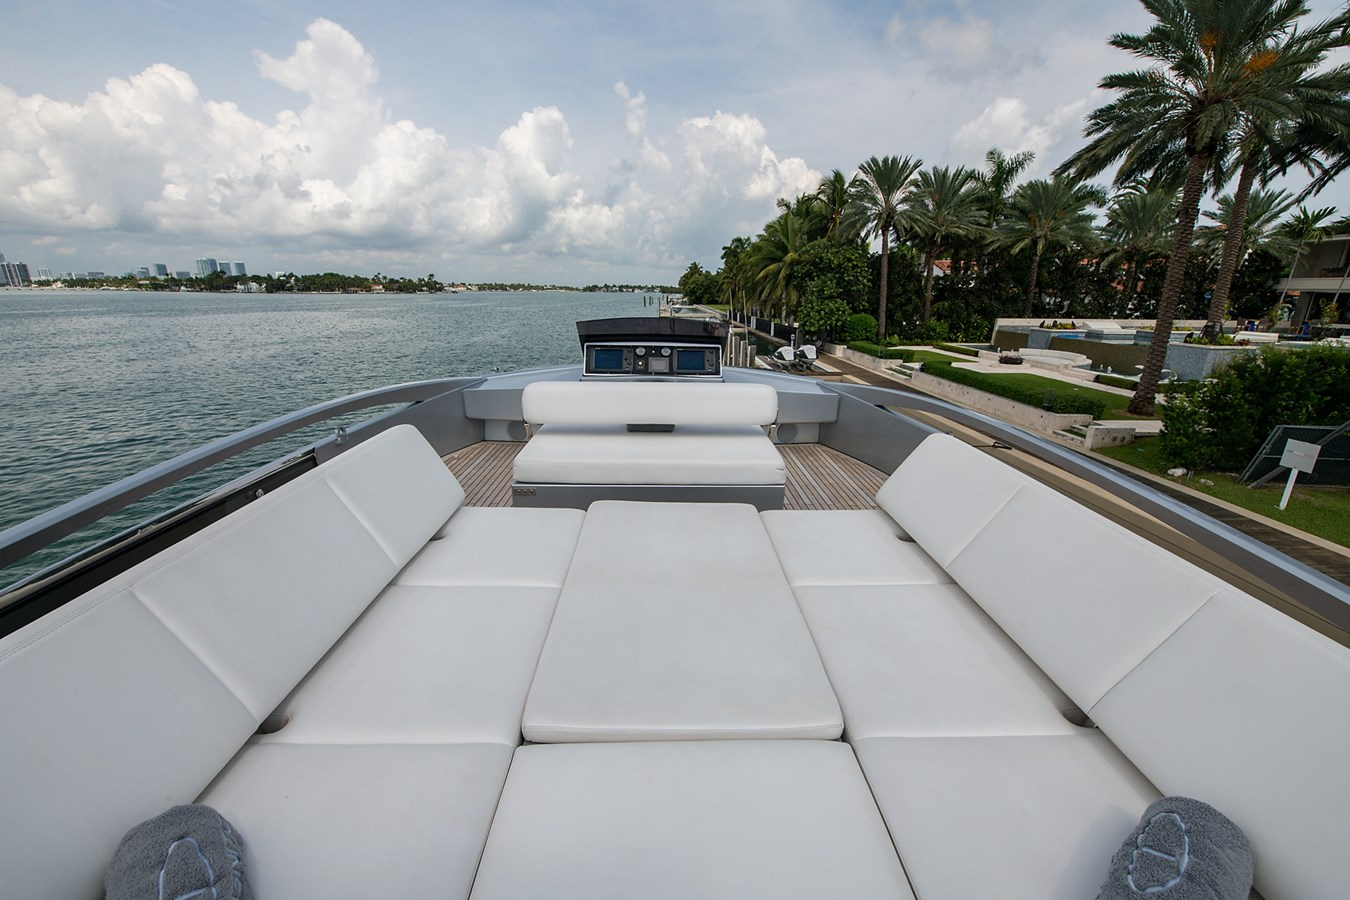 Incognito_Bridge7 2012 PERSHING  Motor Yacht 2810304